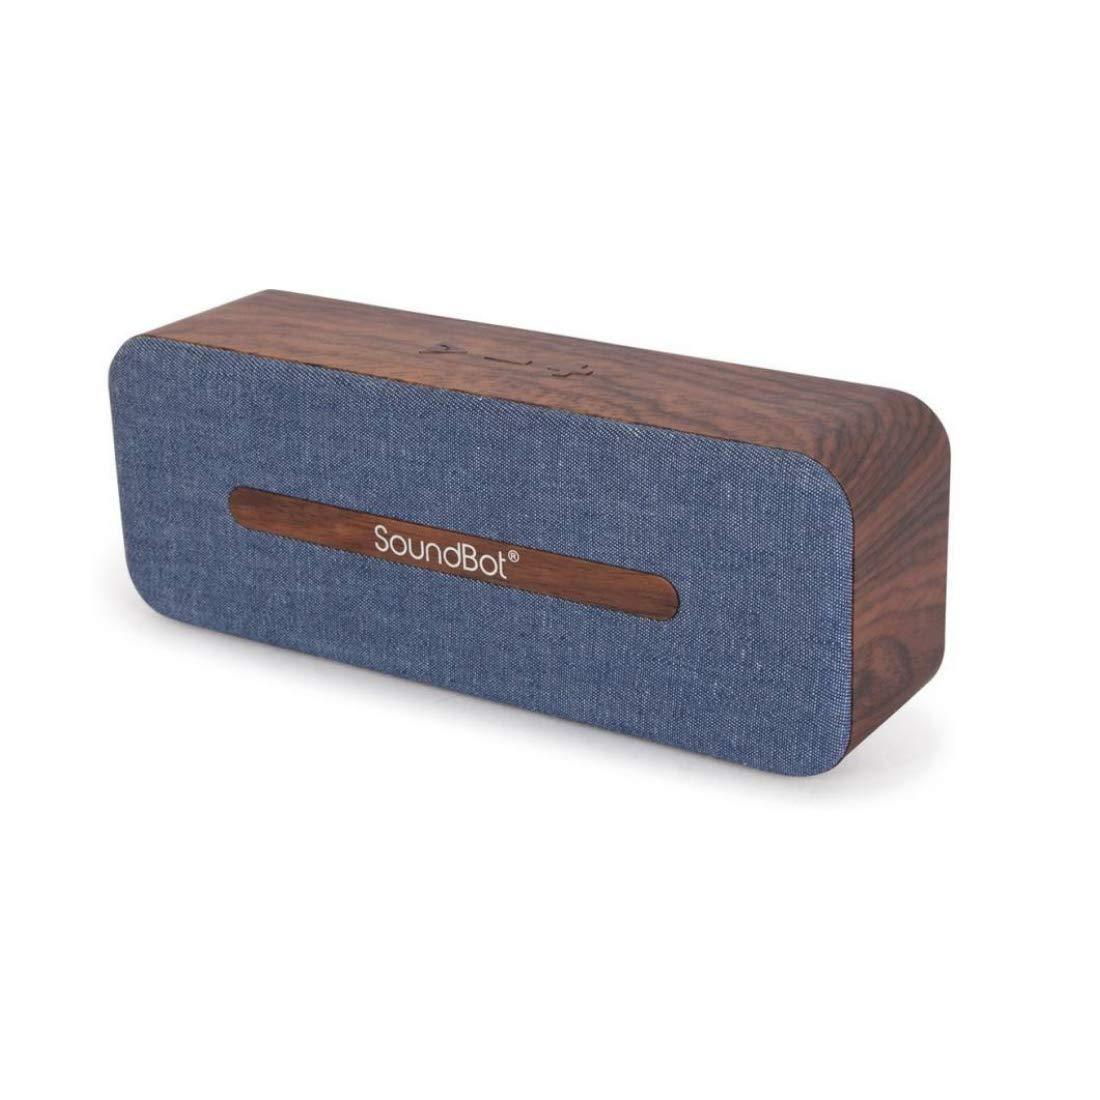 SoundBot SB574 Bluetooth 4.2 Wireless Speaker